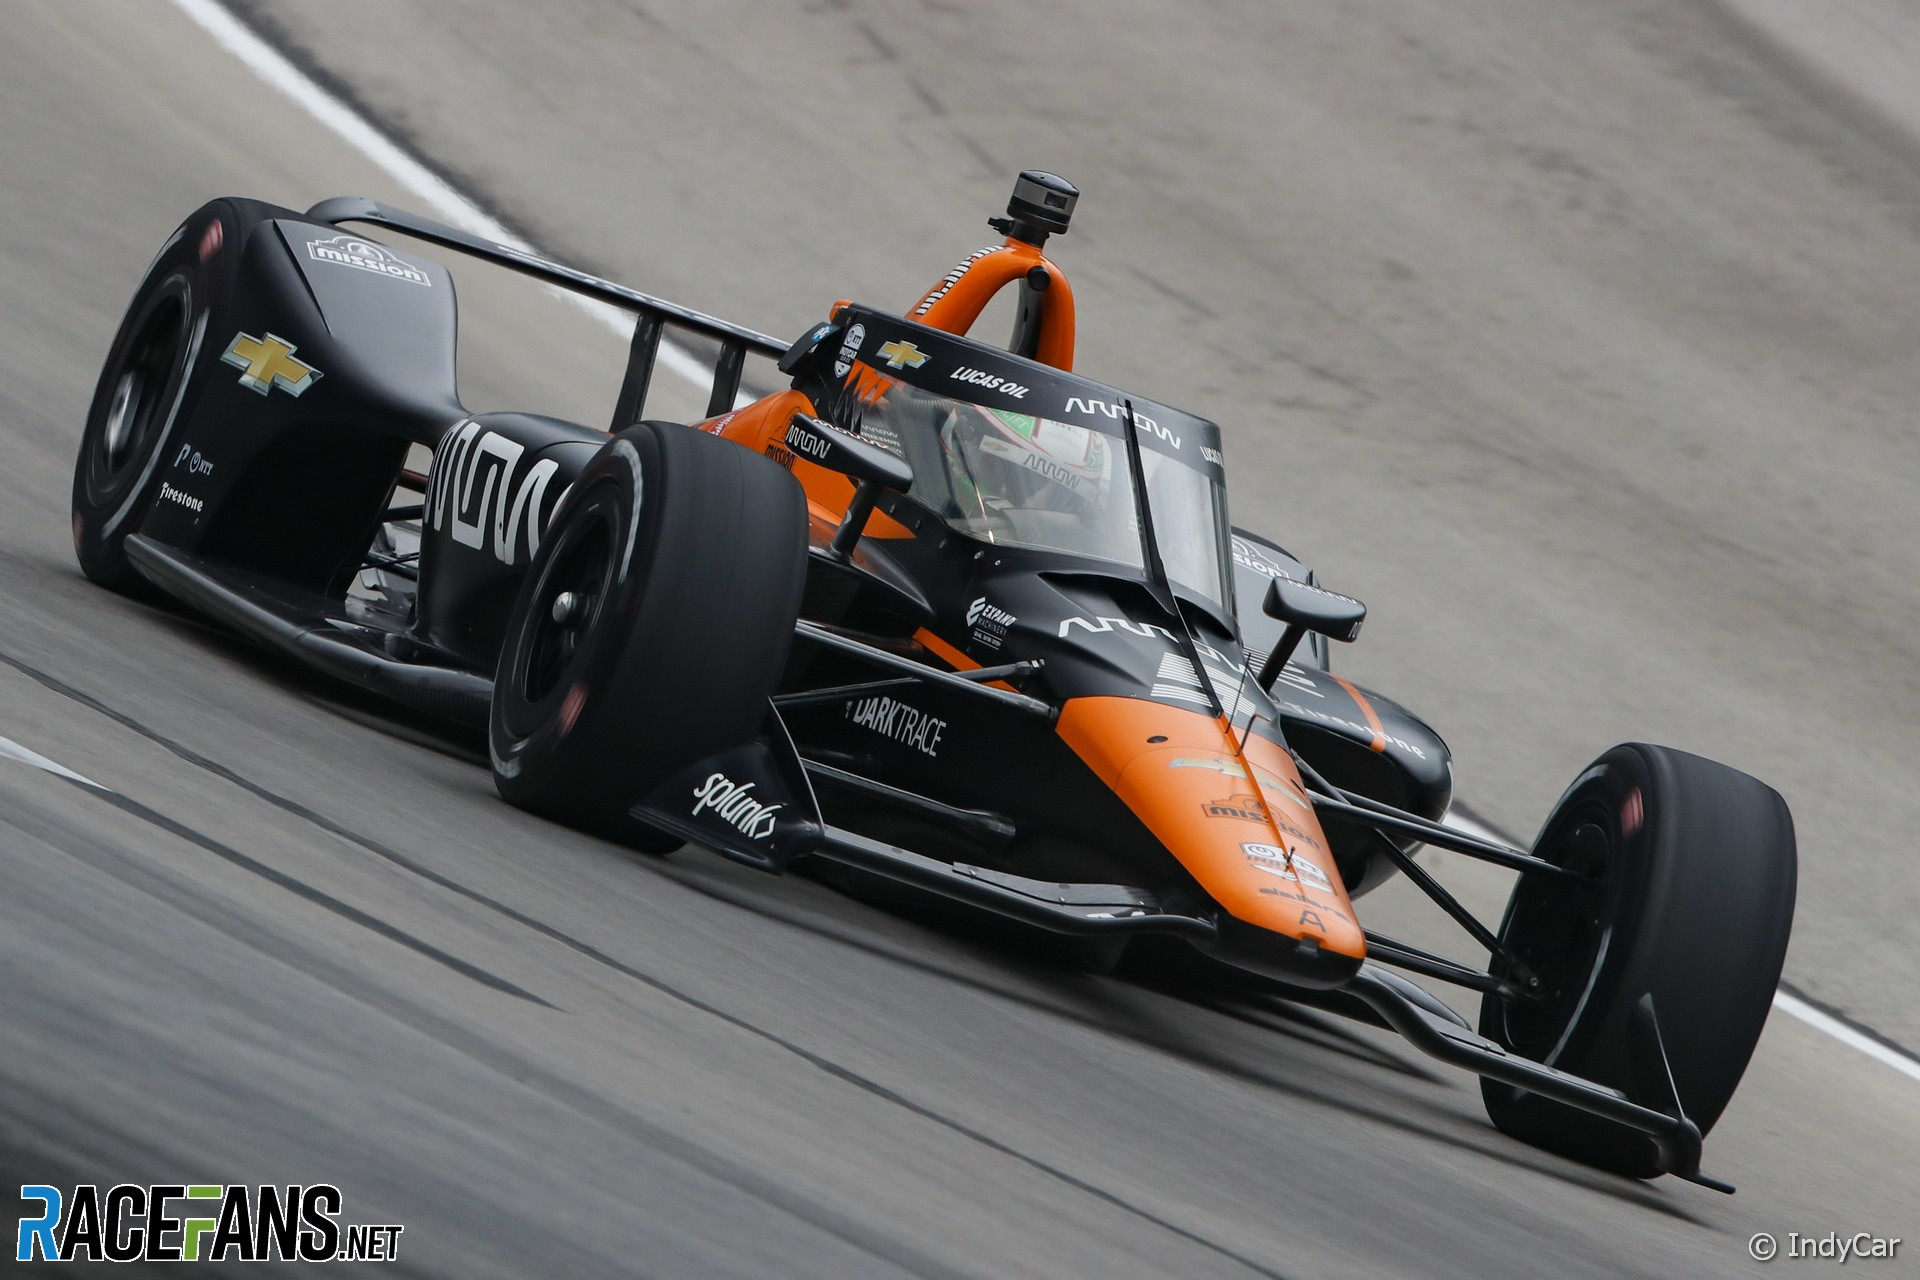 Patricio O'Ward, McLaren SP, IndyCar, Texas Motor Speedway, 2021